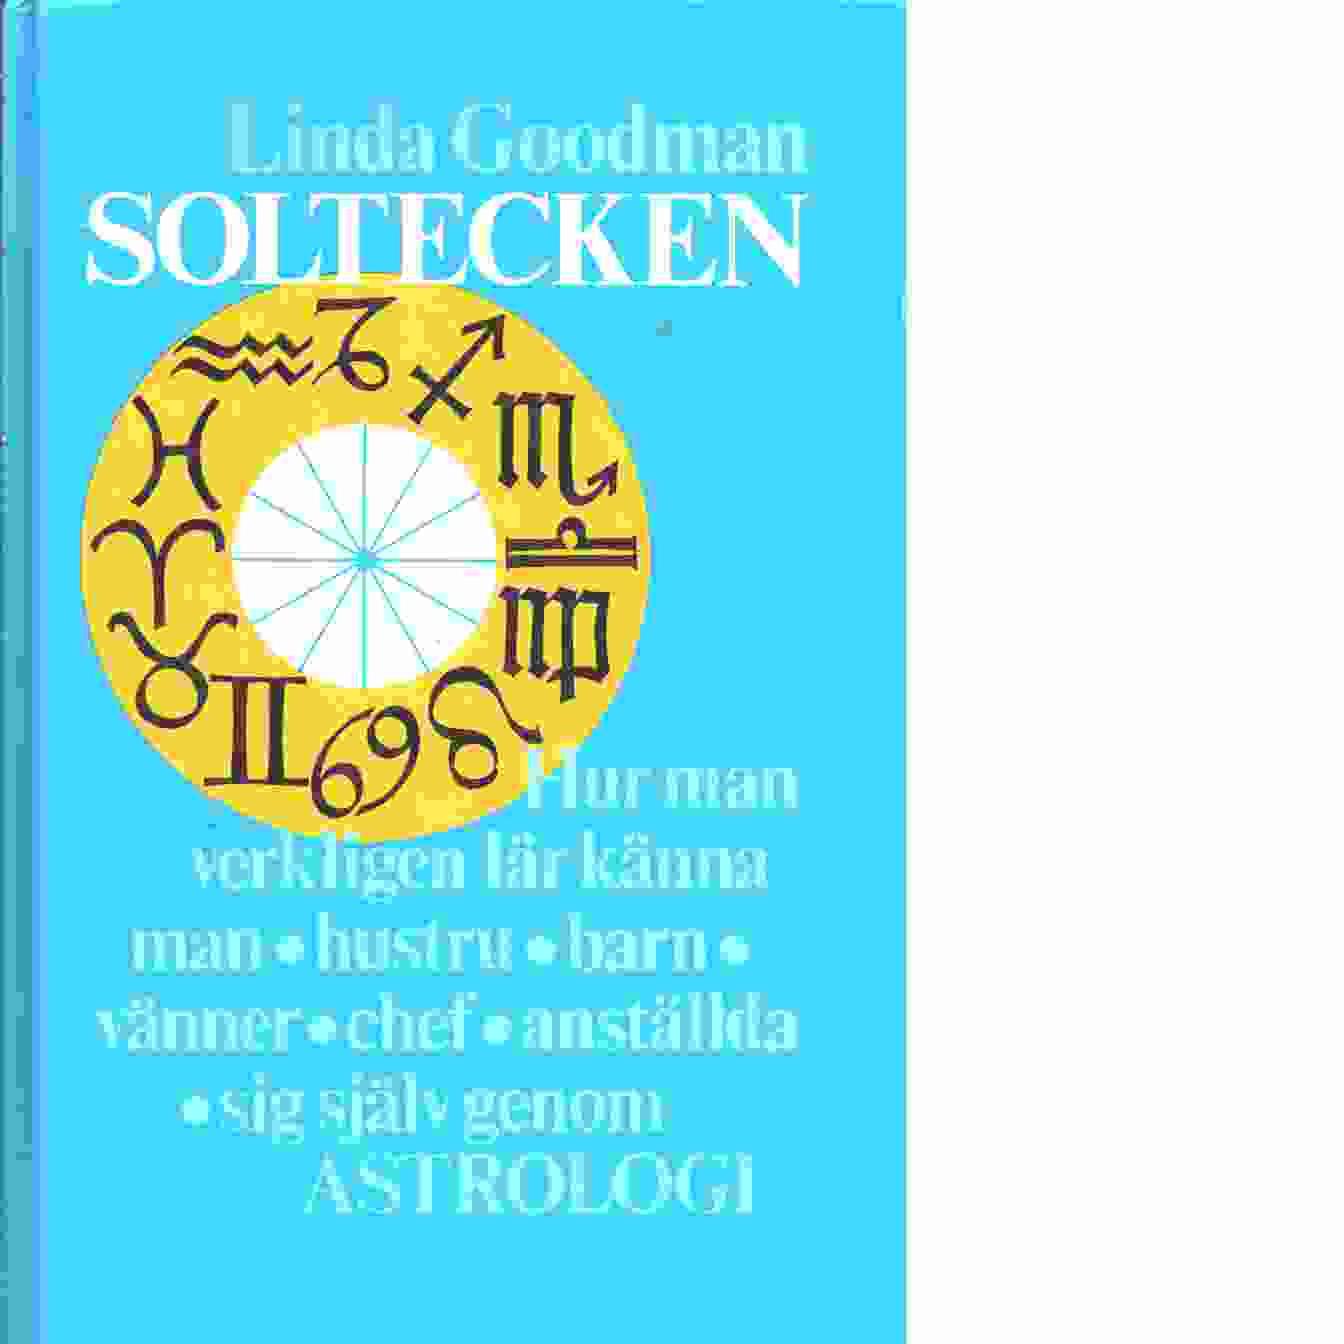 Soltecken - Goodman, Linda